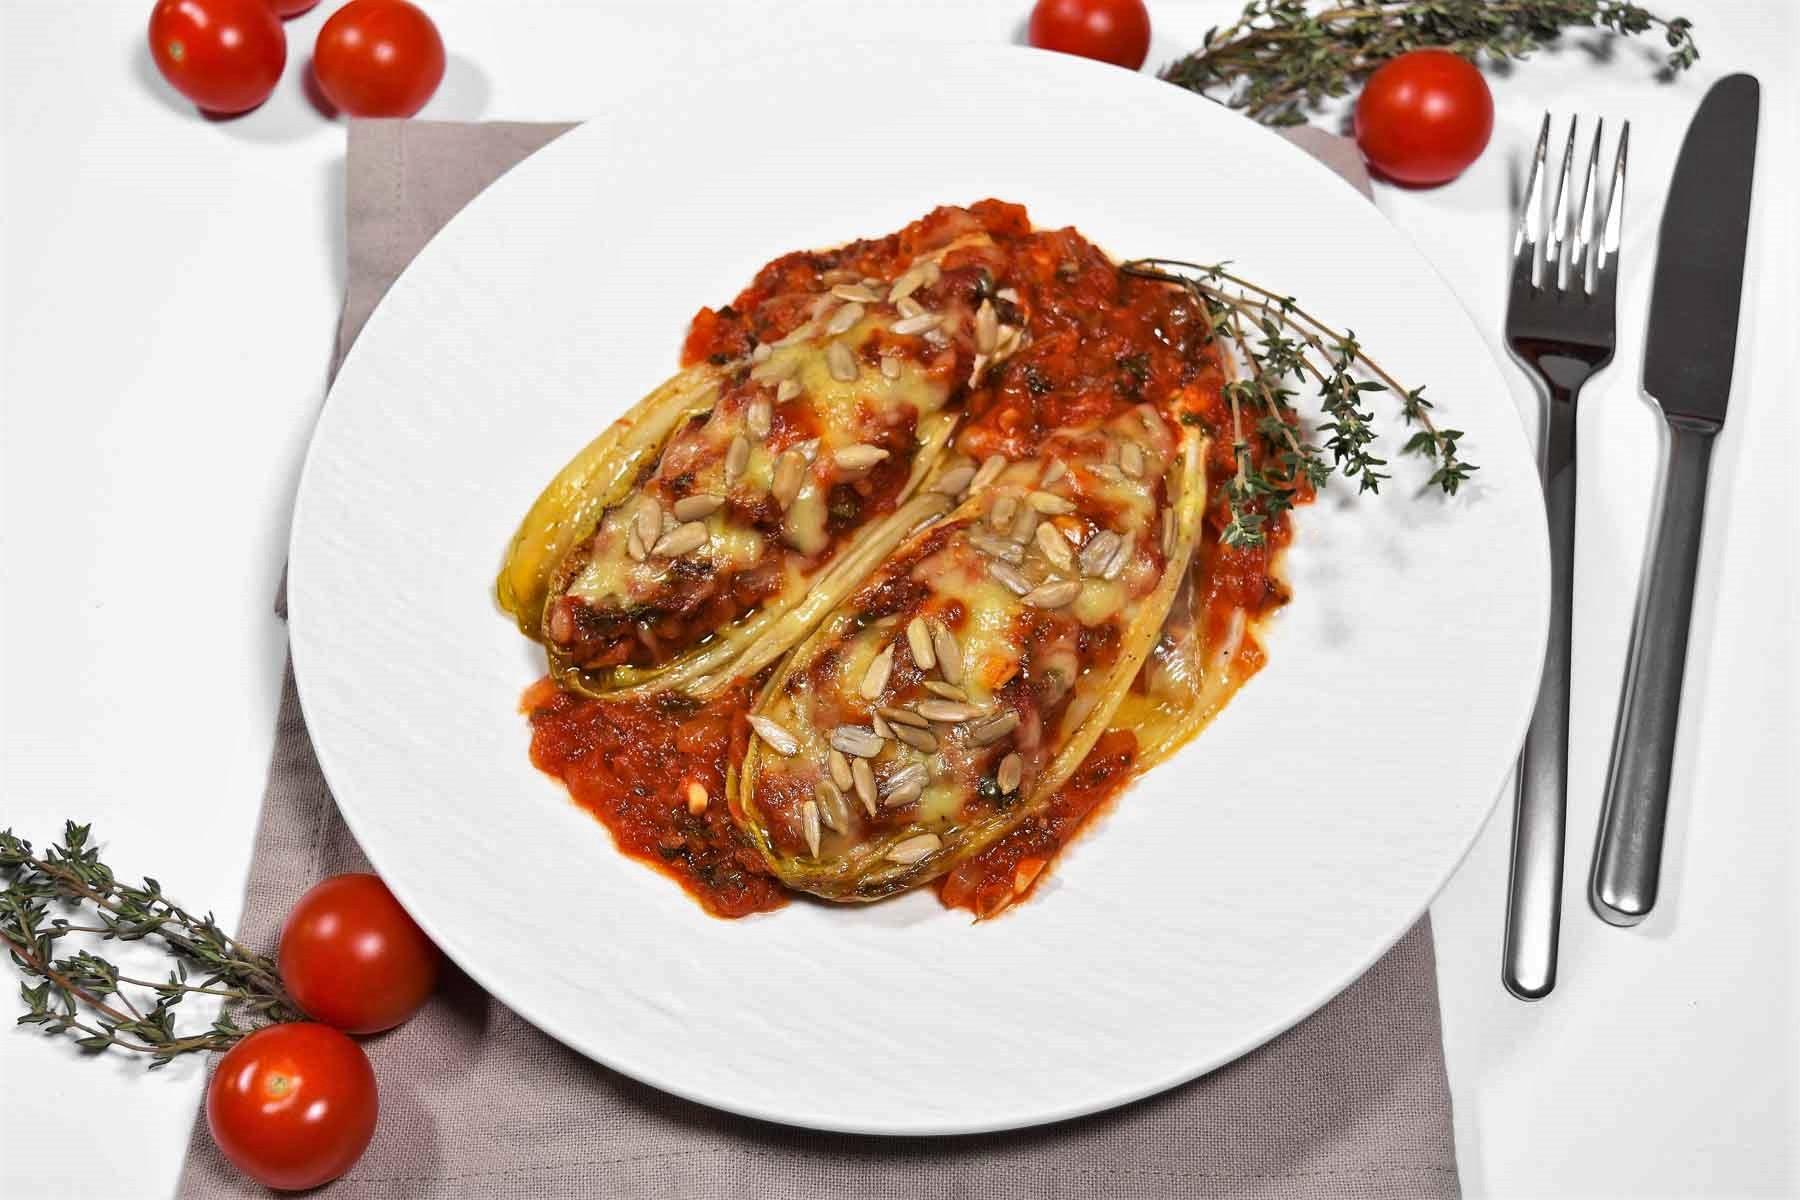 Chicorée-Tomaten-Auflauf